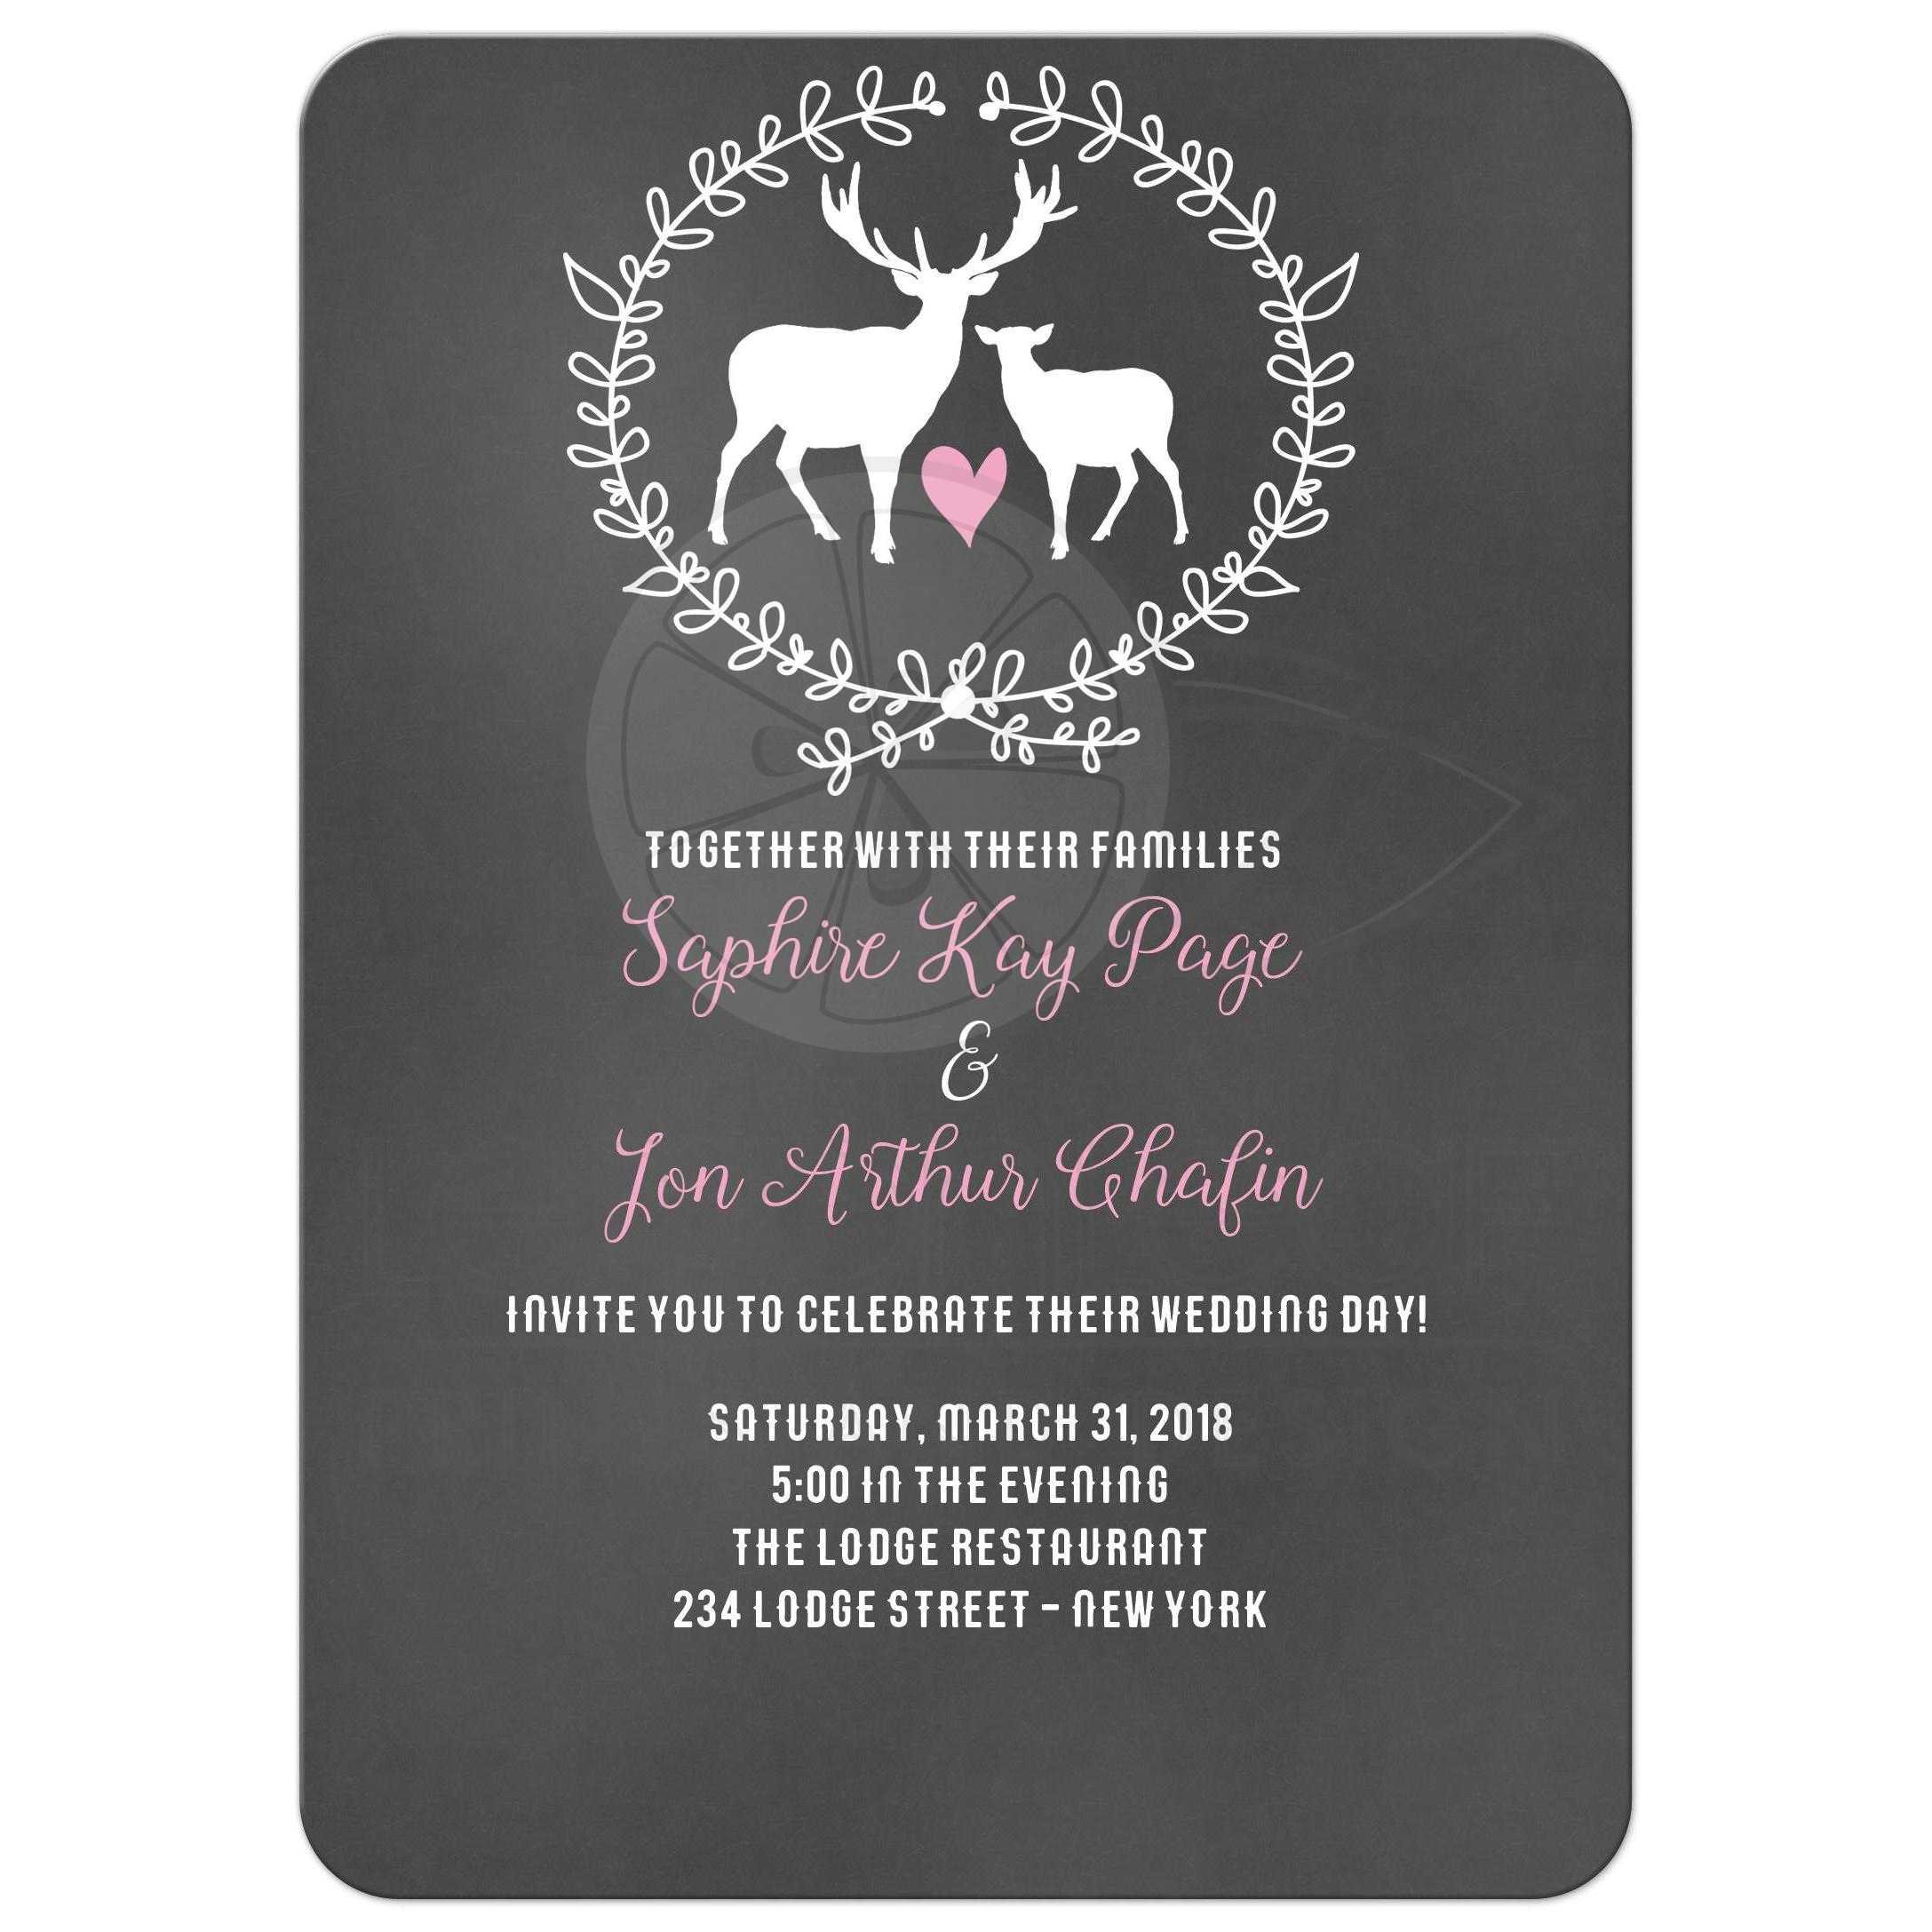 Deer Buck and Doe Chalkboard Wedding Invitations